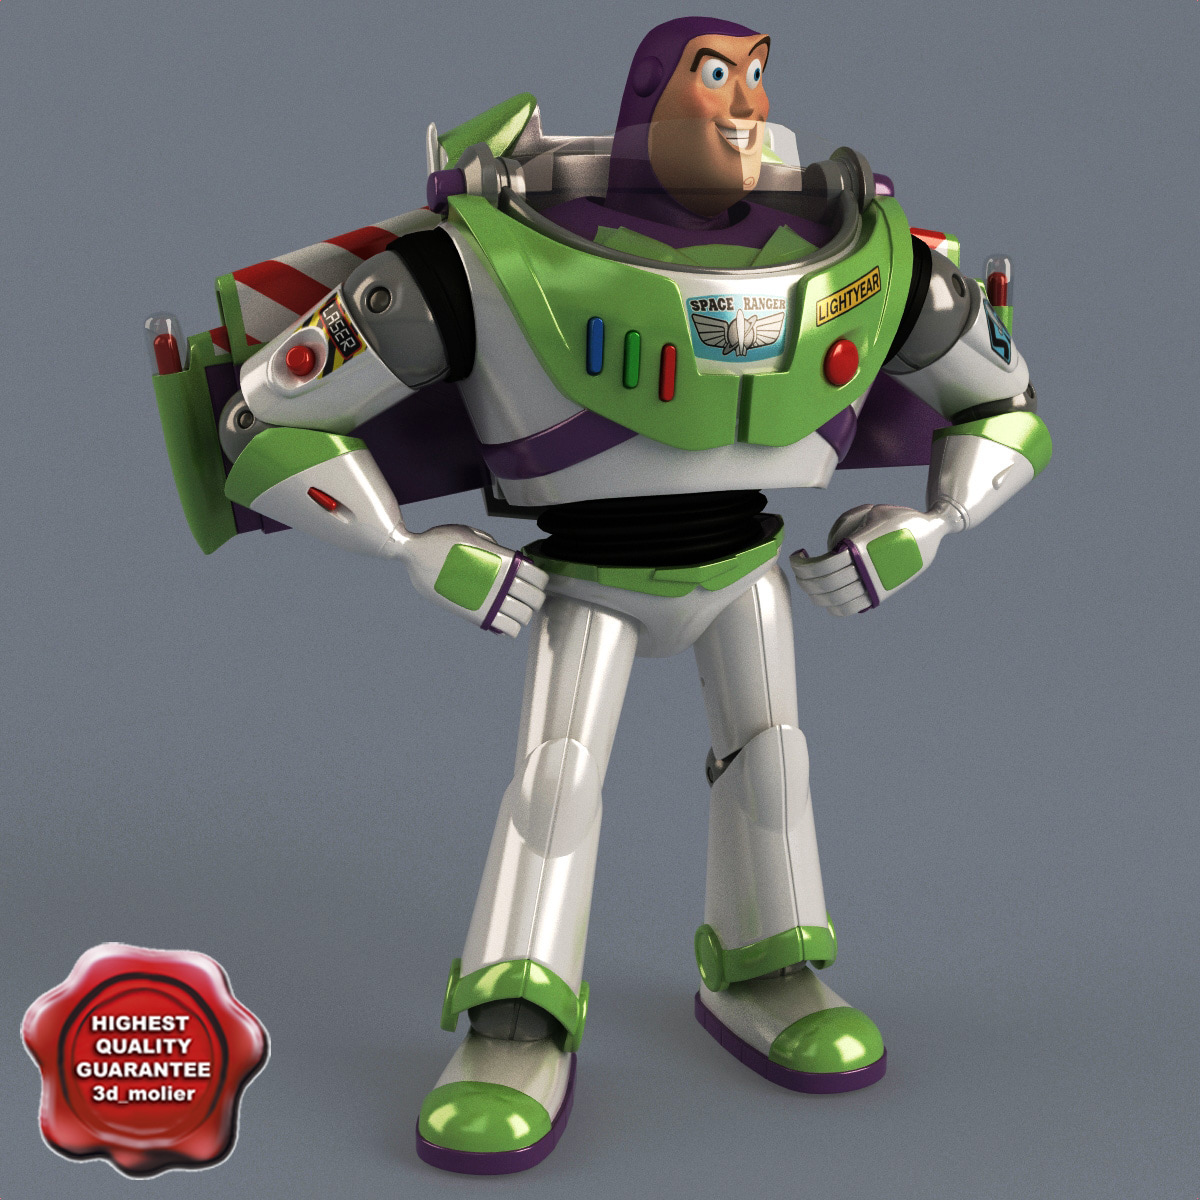 3ds buzz lightyear pose 1